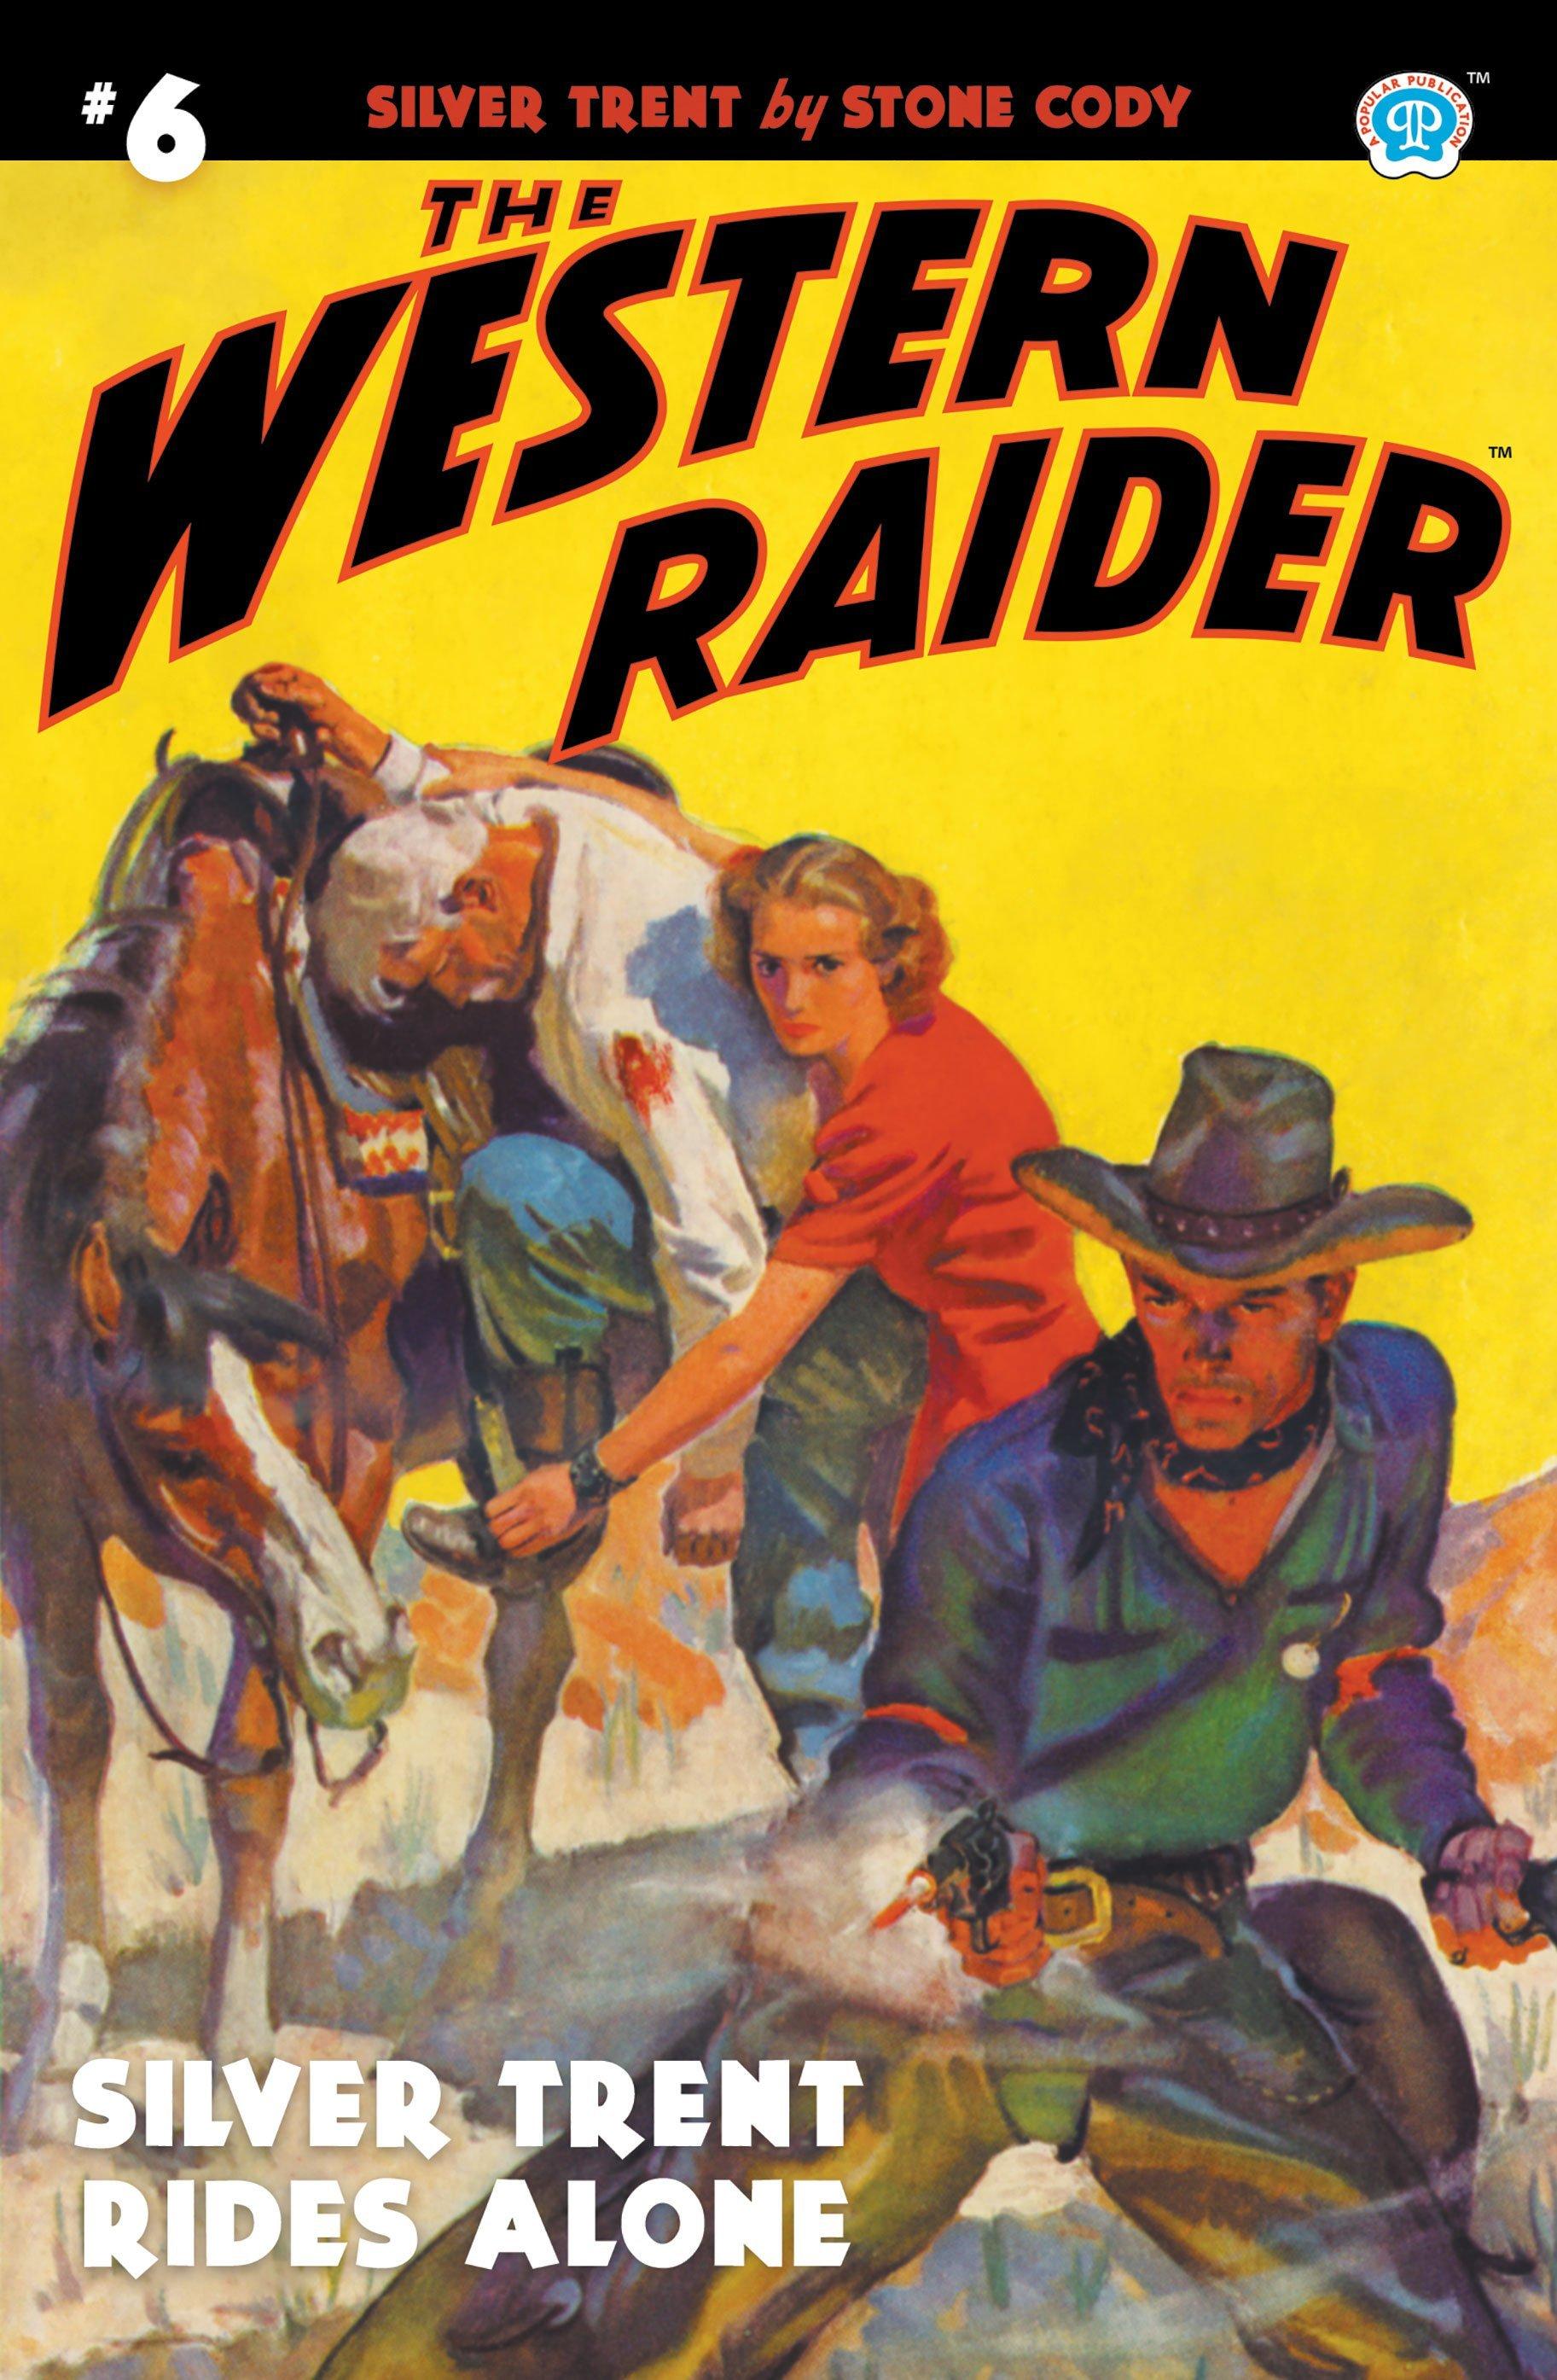 The Western Raider #6: Silver Trent Rides Alone